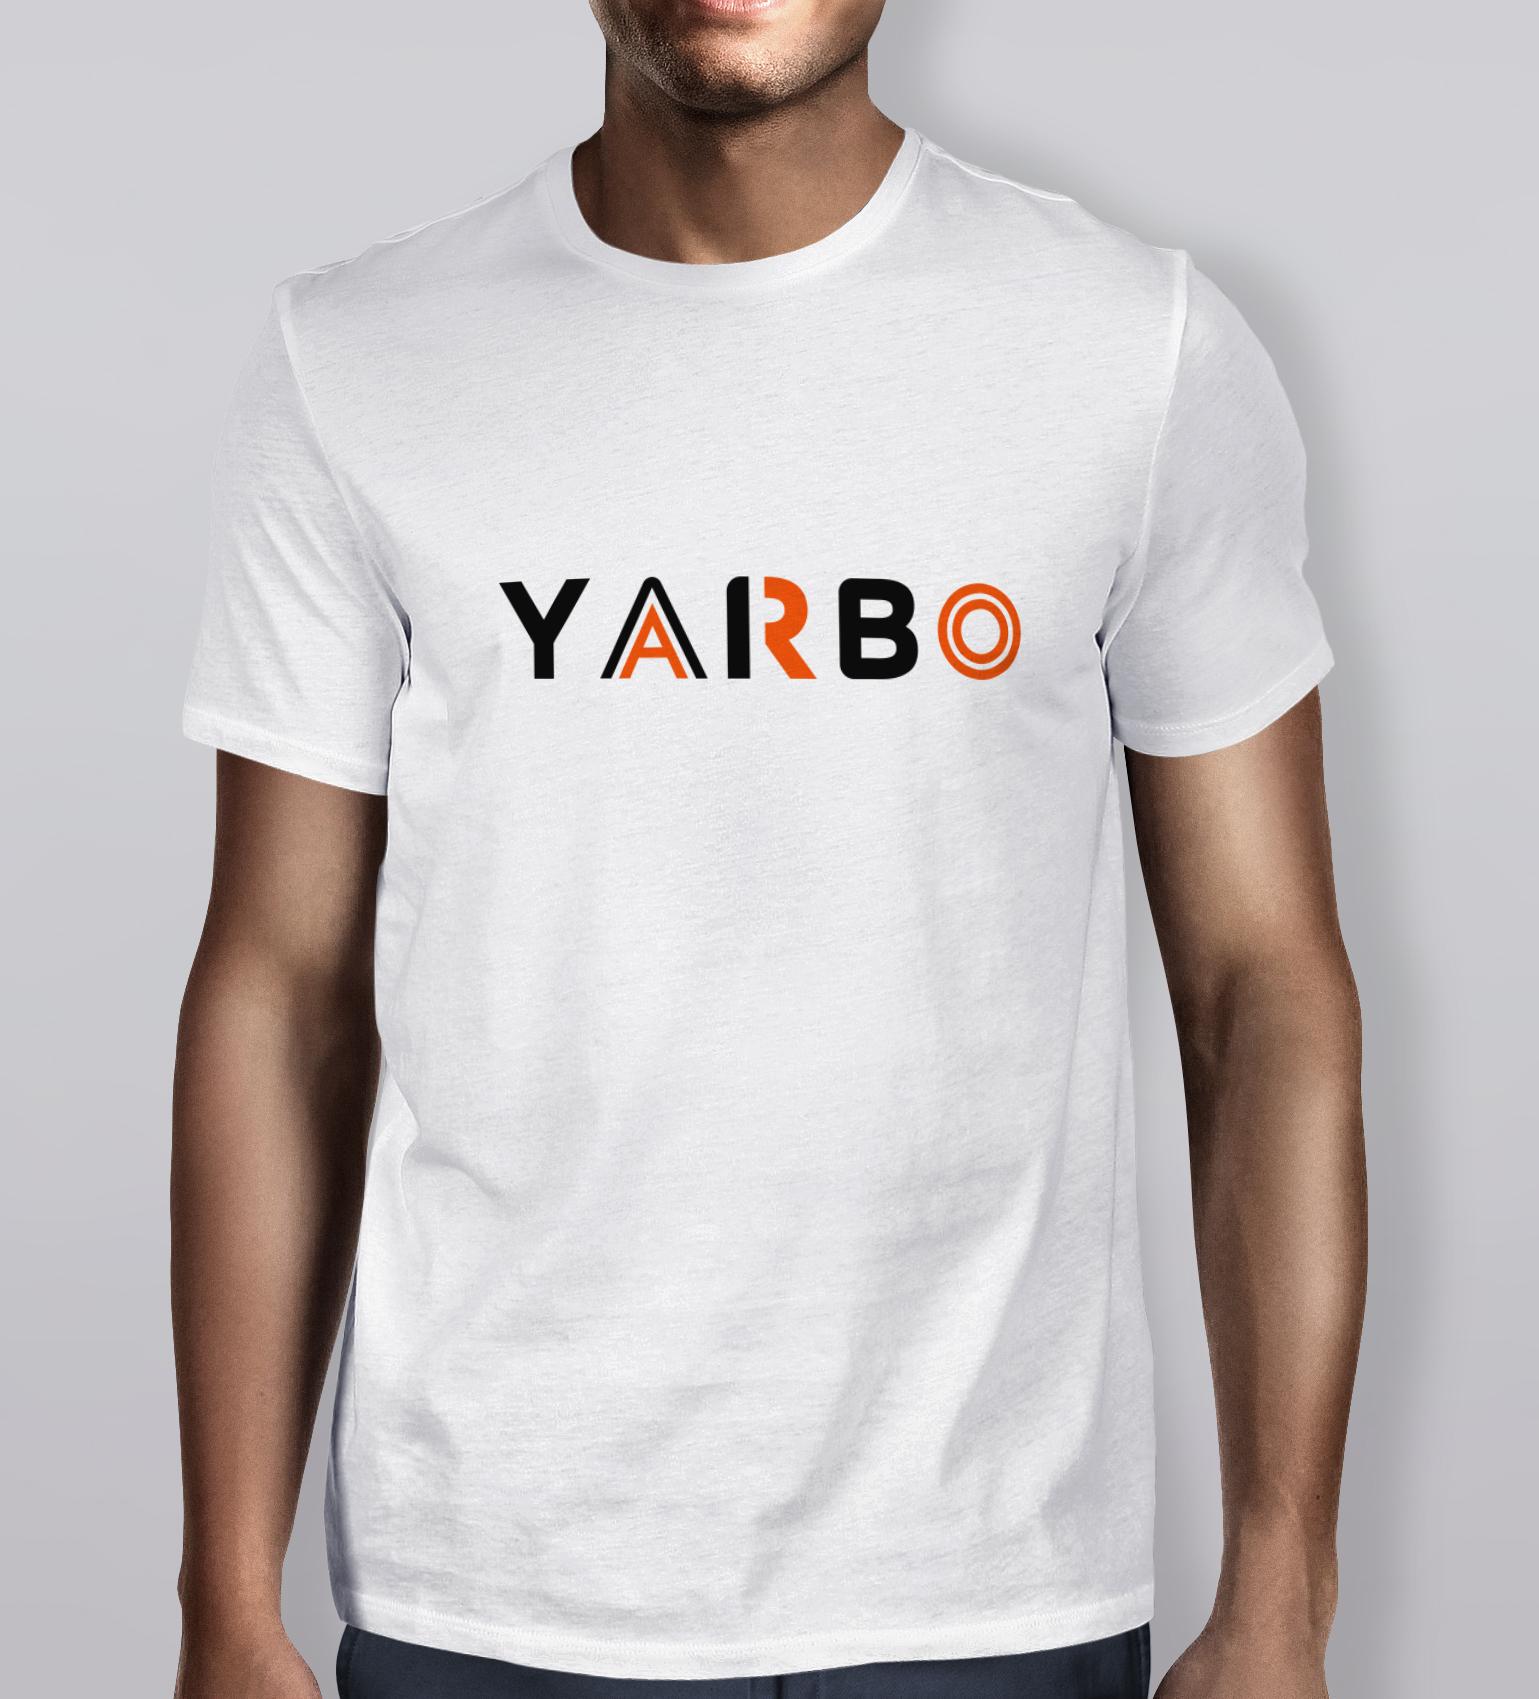 Yarbo 2